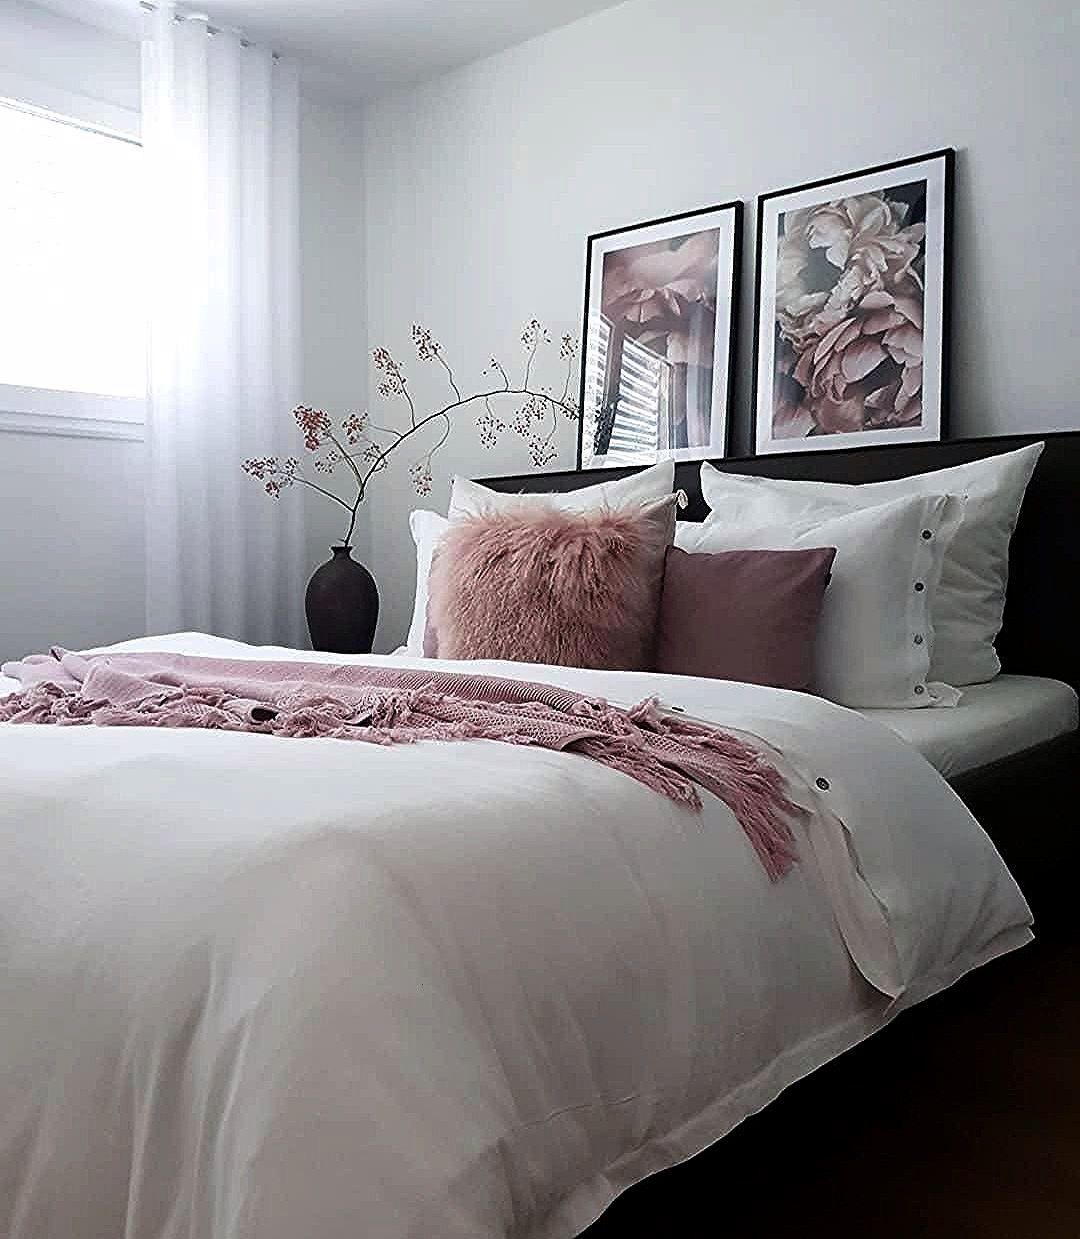 Schlafzimmerideen Schaffellkissen Wunderschonen Skandinavisch